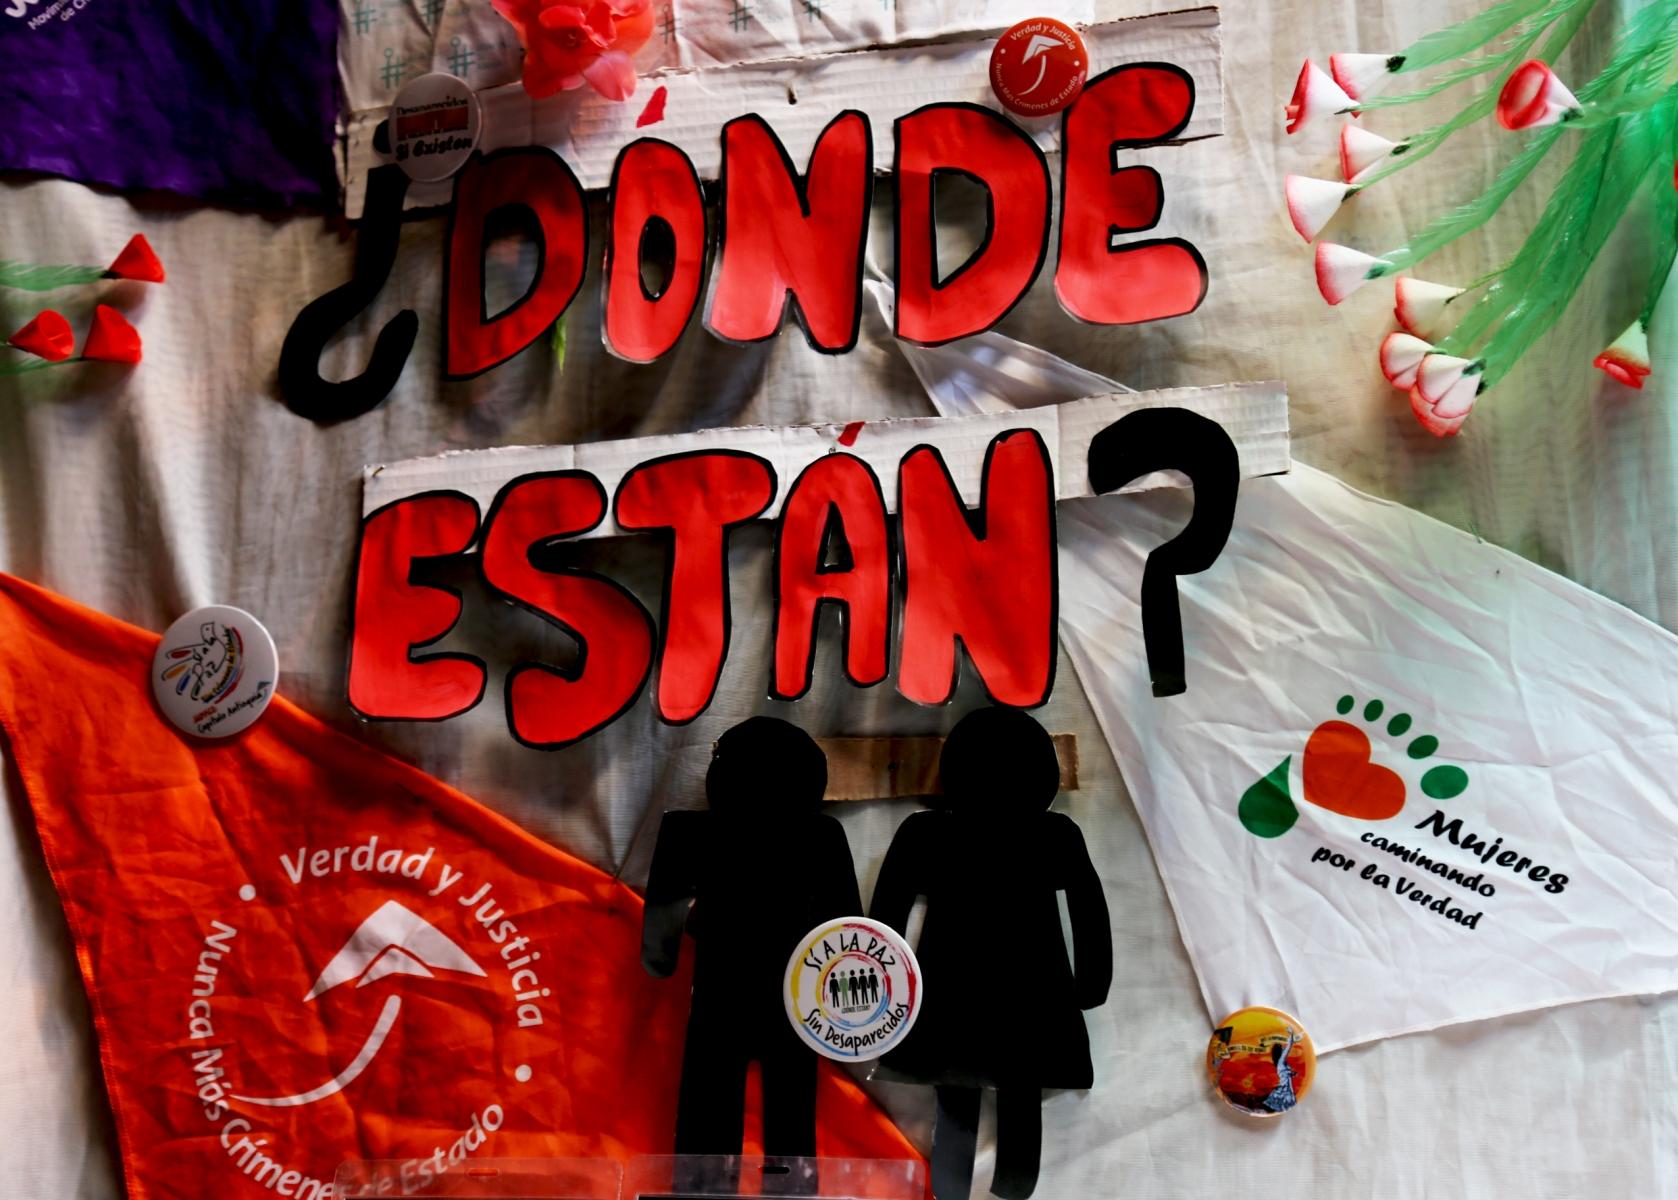 Rosa Edelmira Vergara Martínez: Desaparecida el 30 de Enero de 1993 en Cáceres - Antioquia.  Jhonairo Alexander Vergara Urango: Desaparecido el 12 de enero de 2001 en Caucasia – Antioquia.